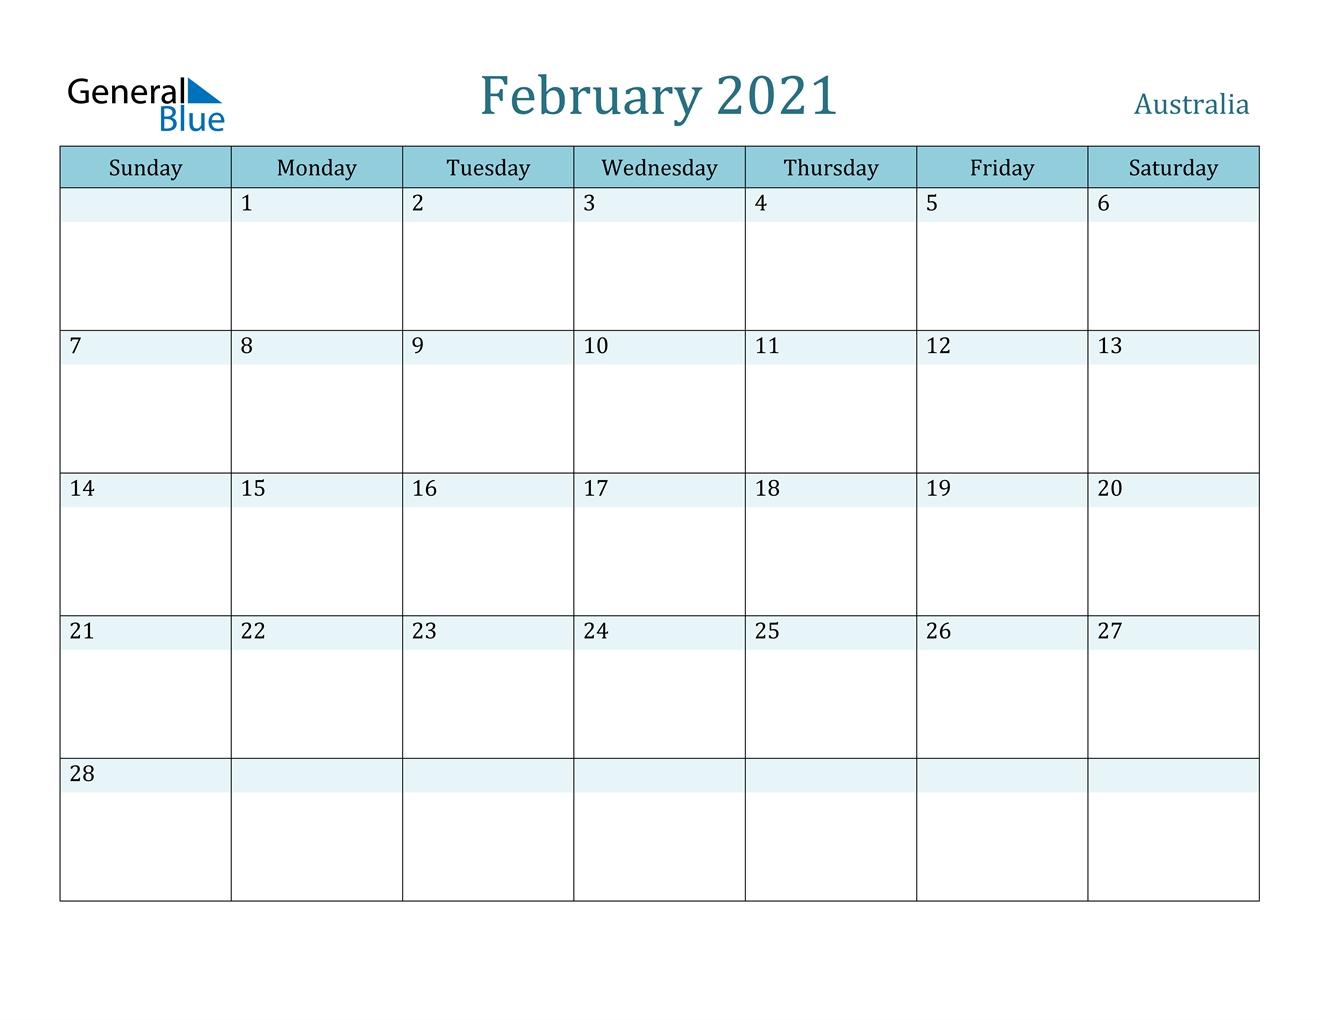 February 2021 Calendar - Australia